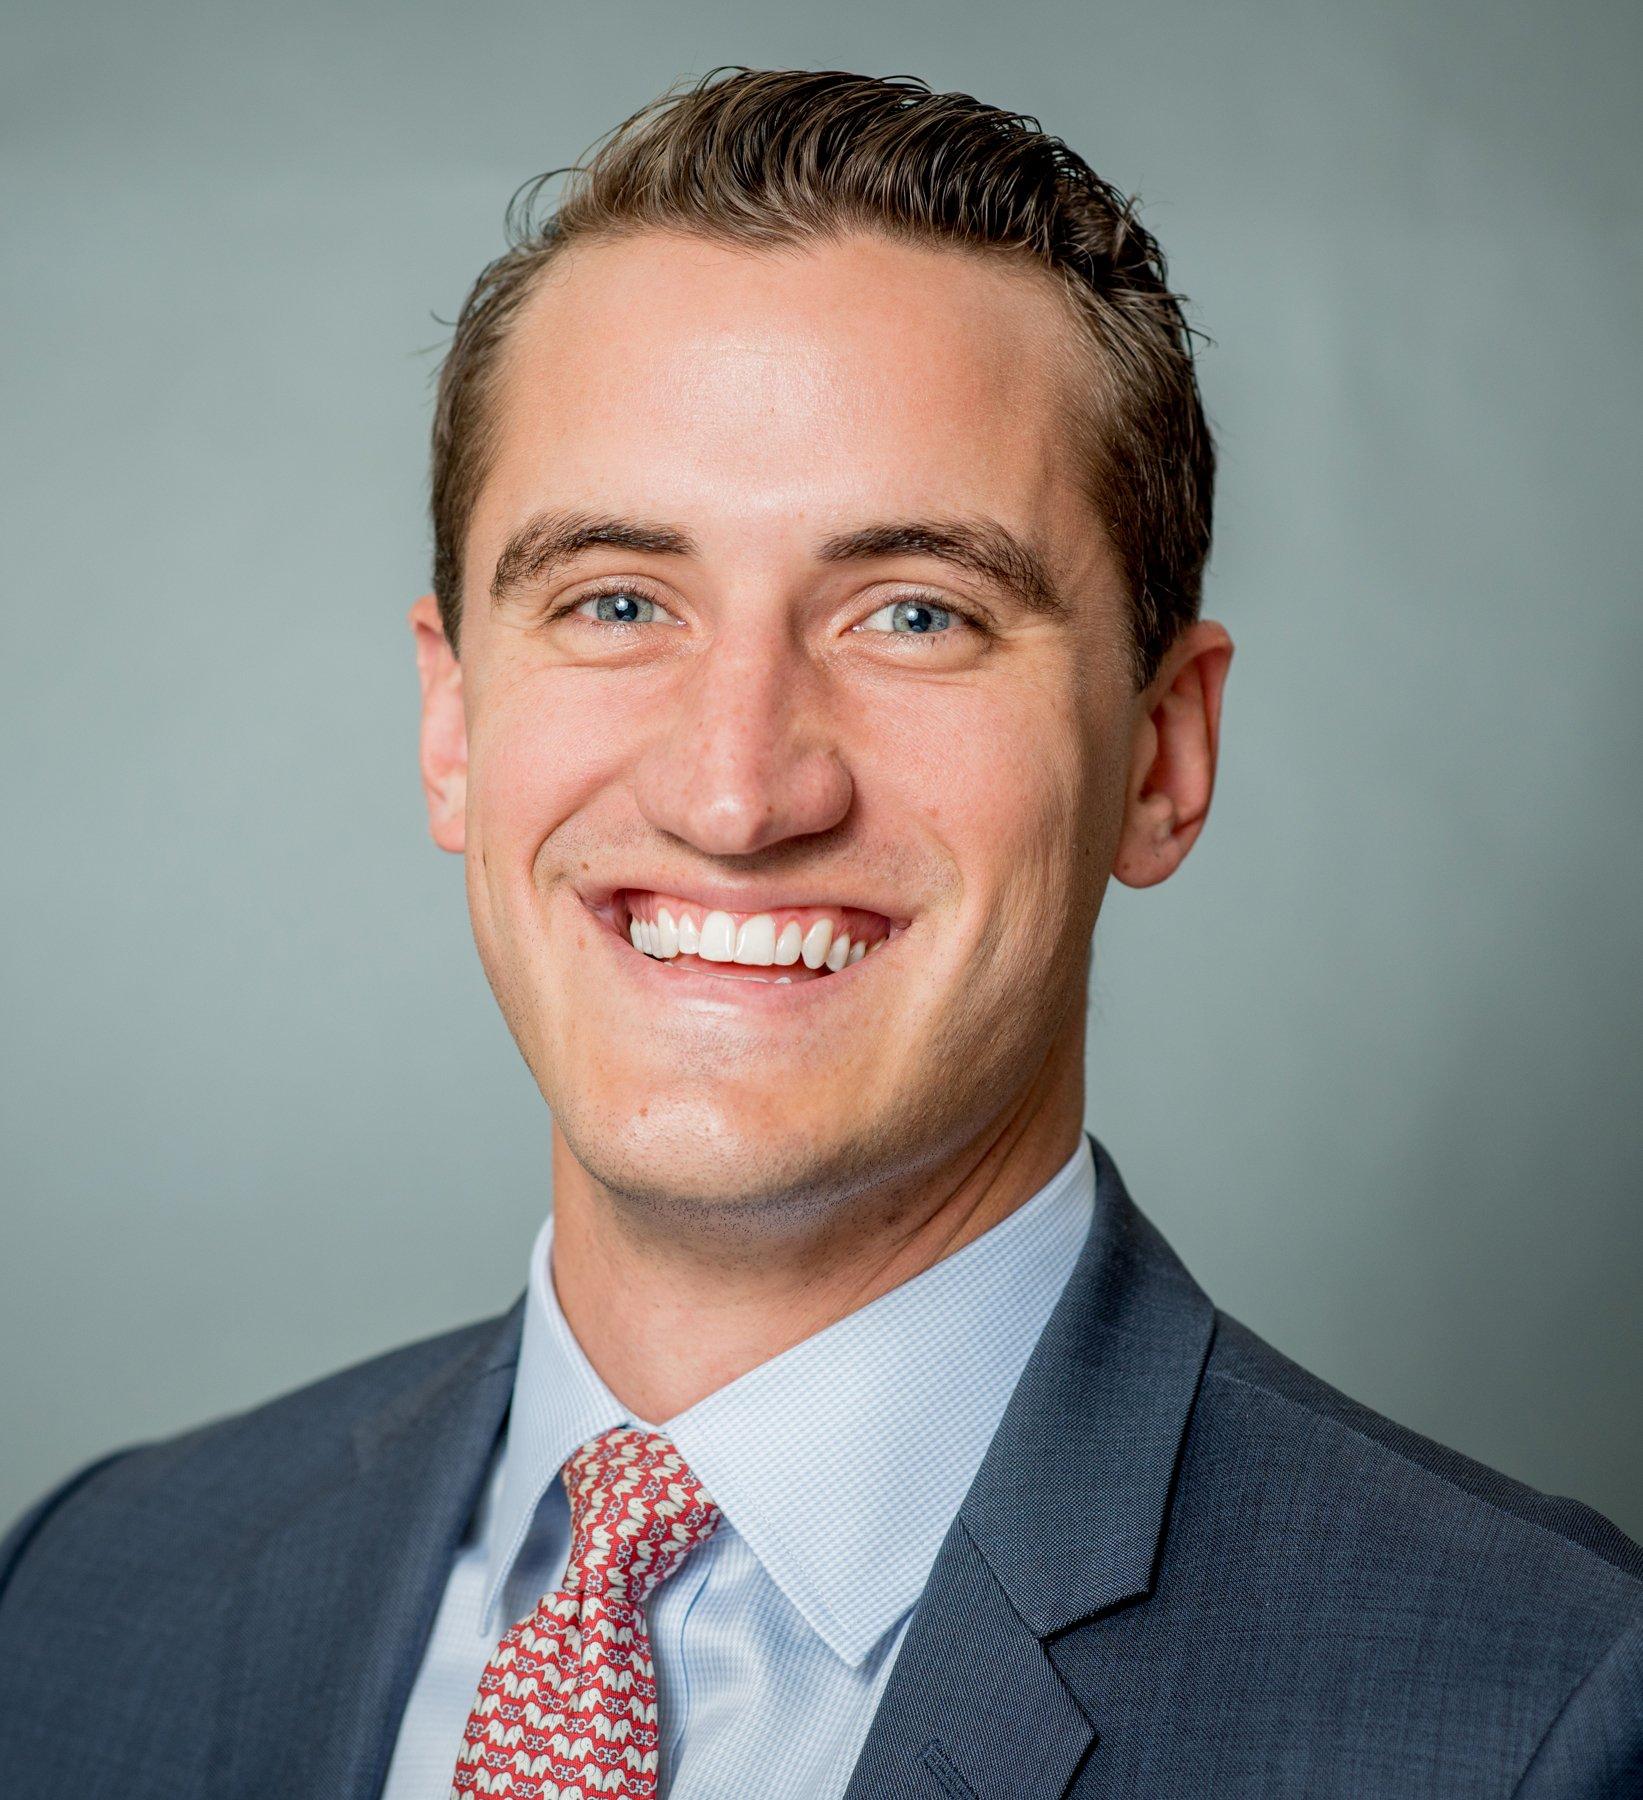 Tim Dolan Headshot | Dakota Investments